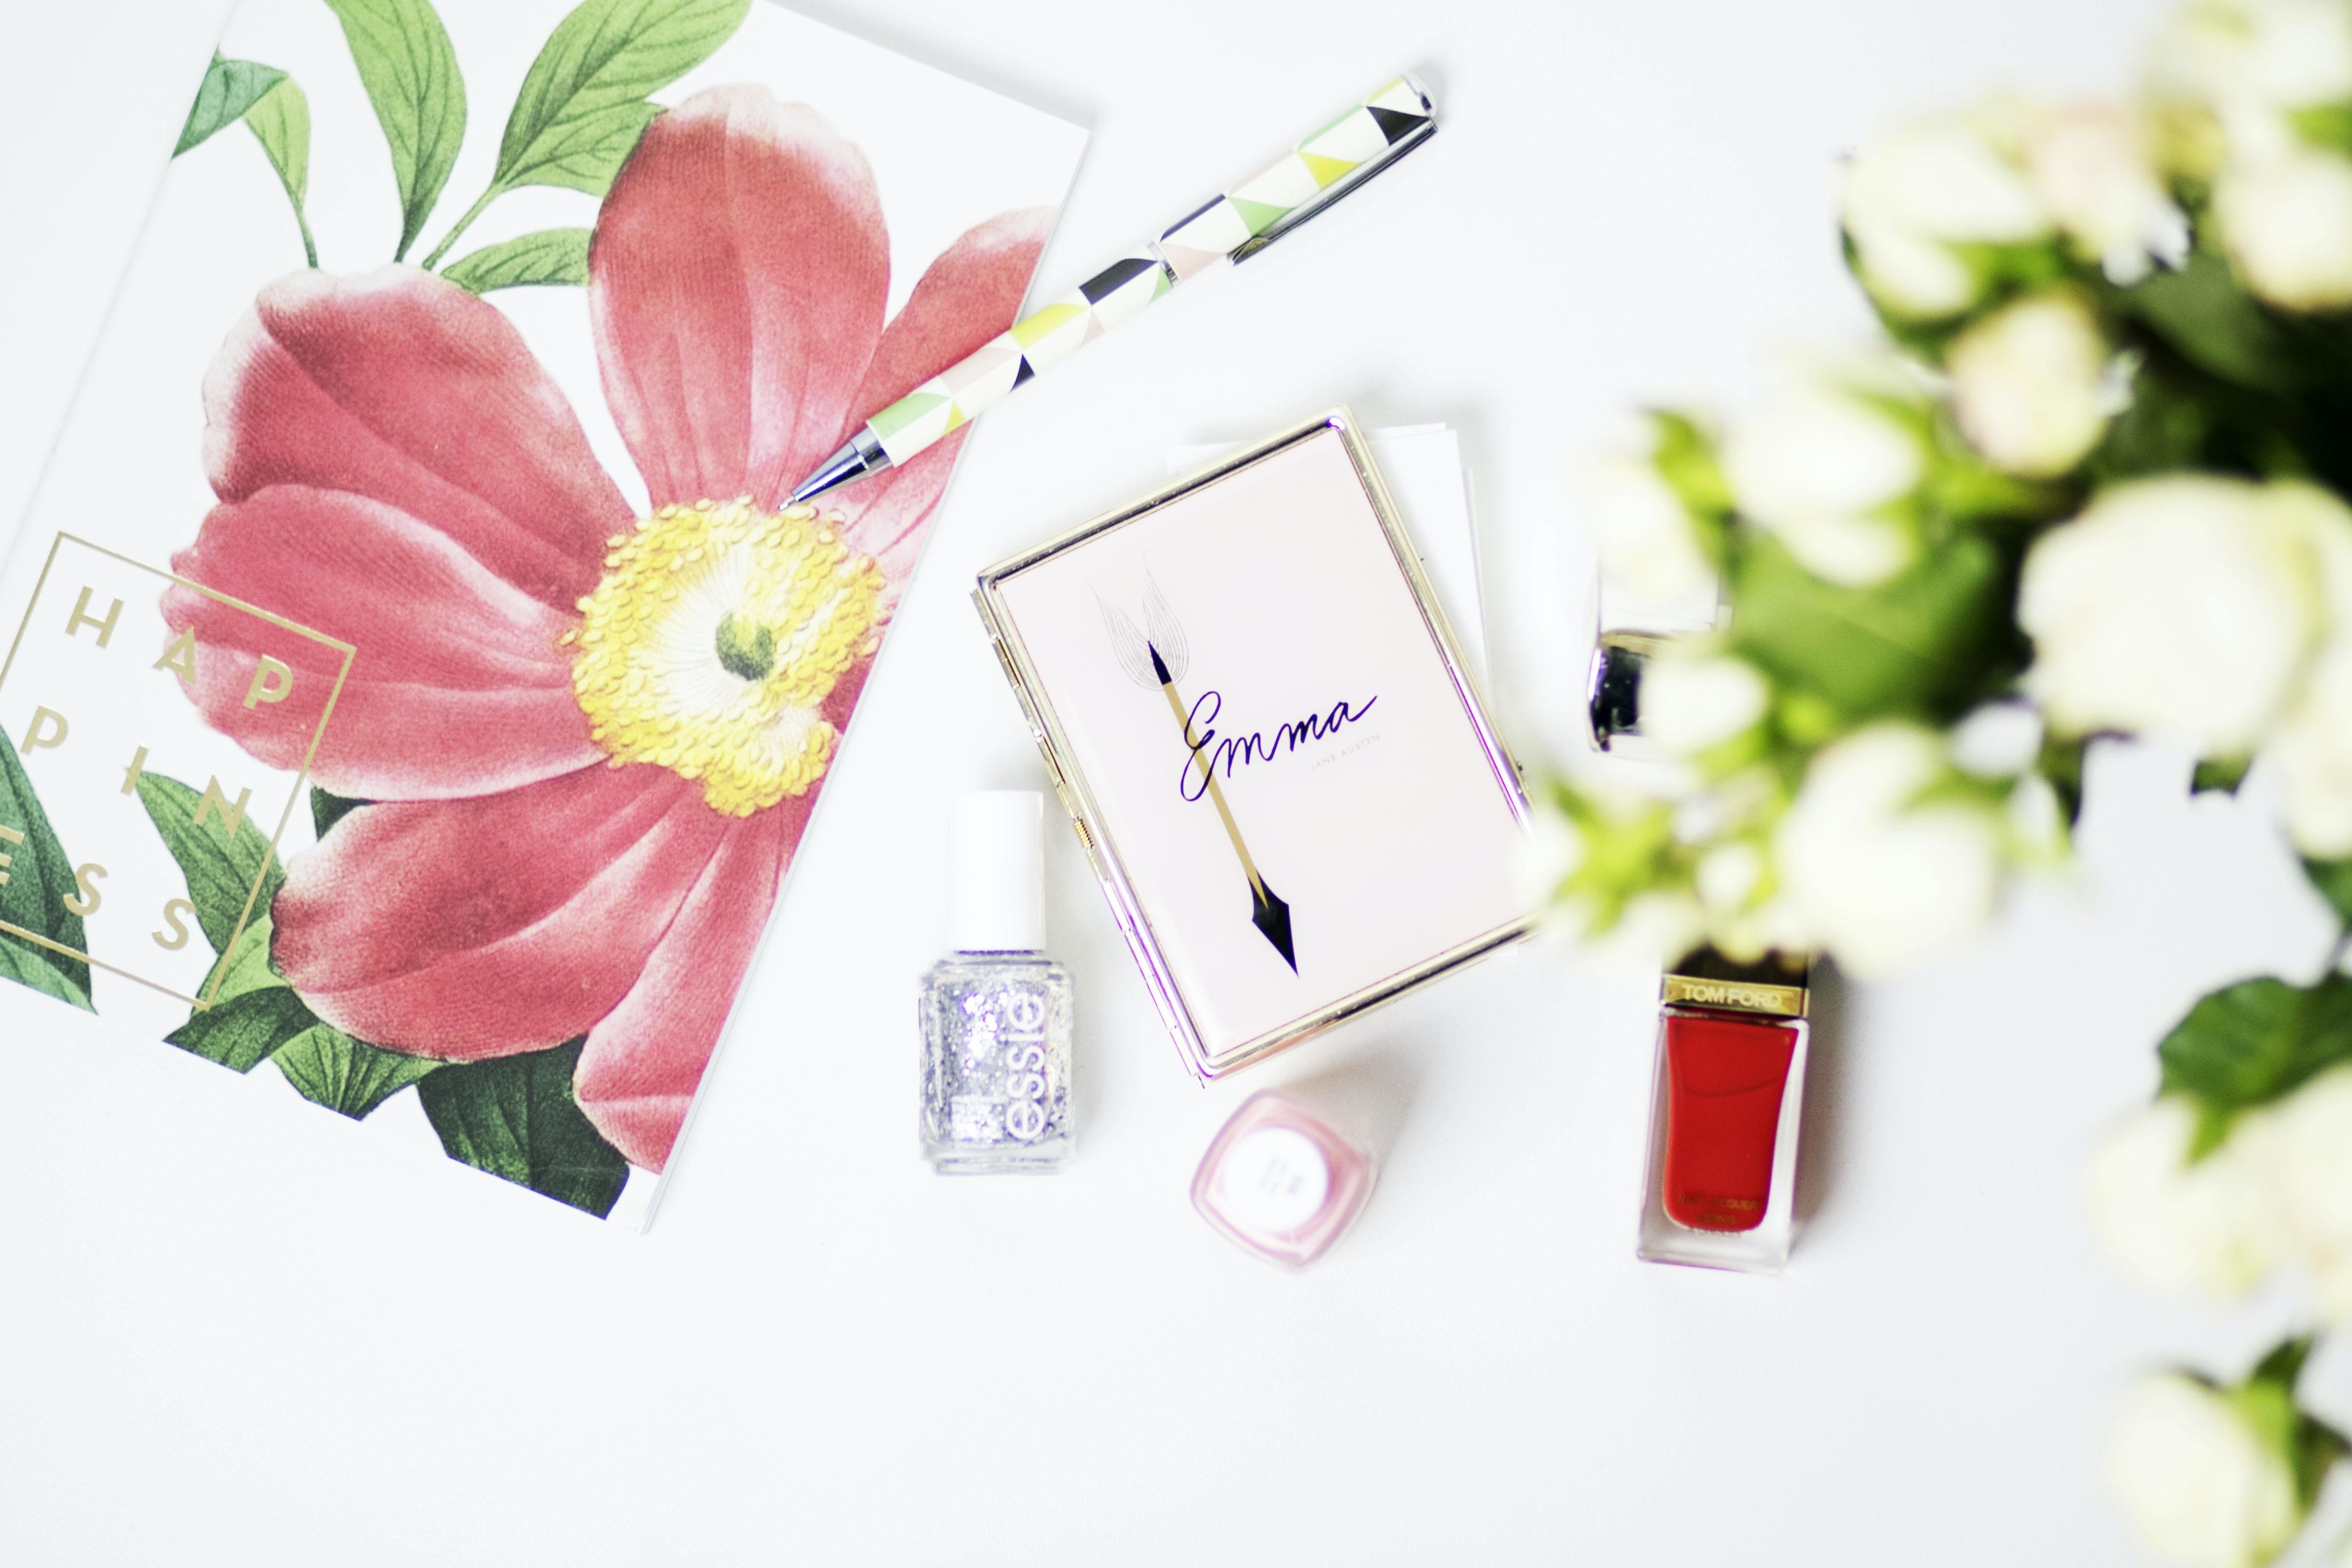 pink Emma box beside nail polish